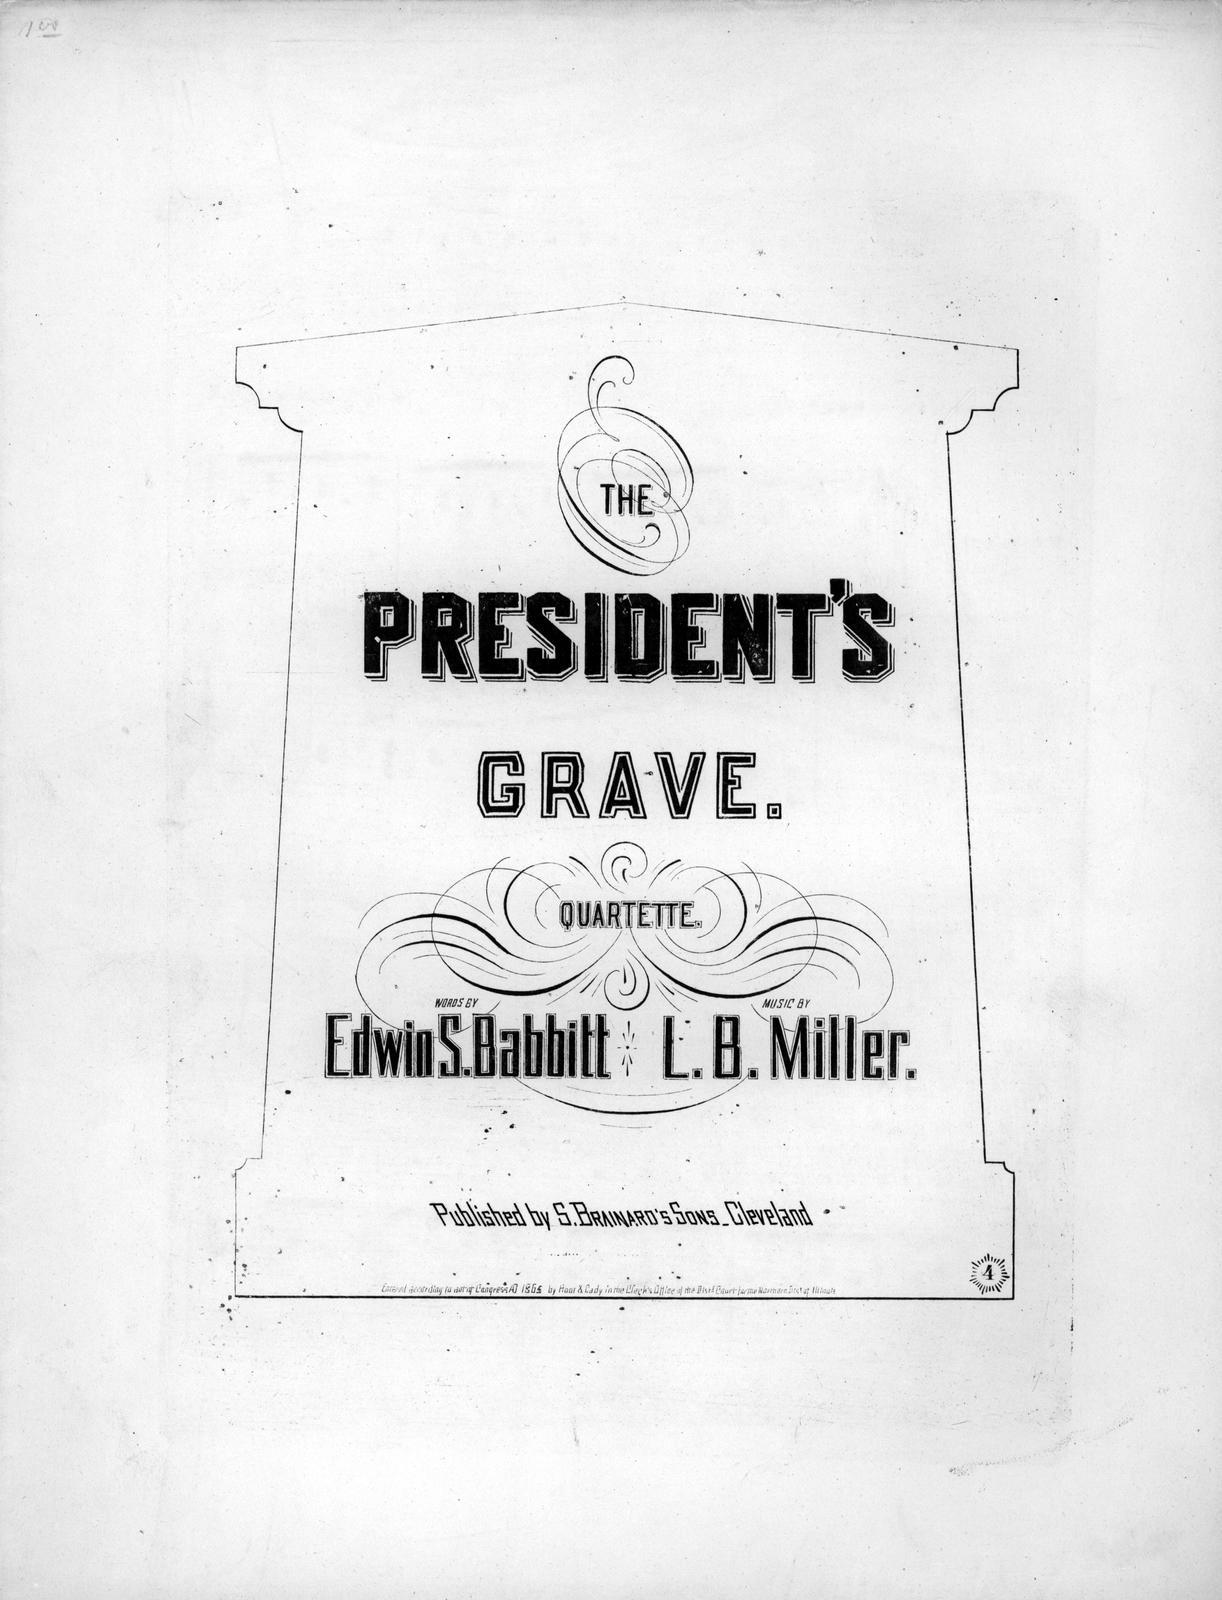 The president's grave: quartette words by Edwin S. Babbitt; music by L.B. Miller.